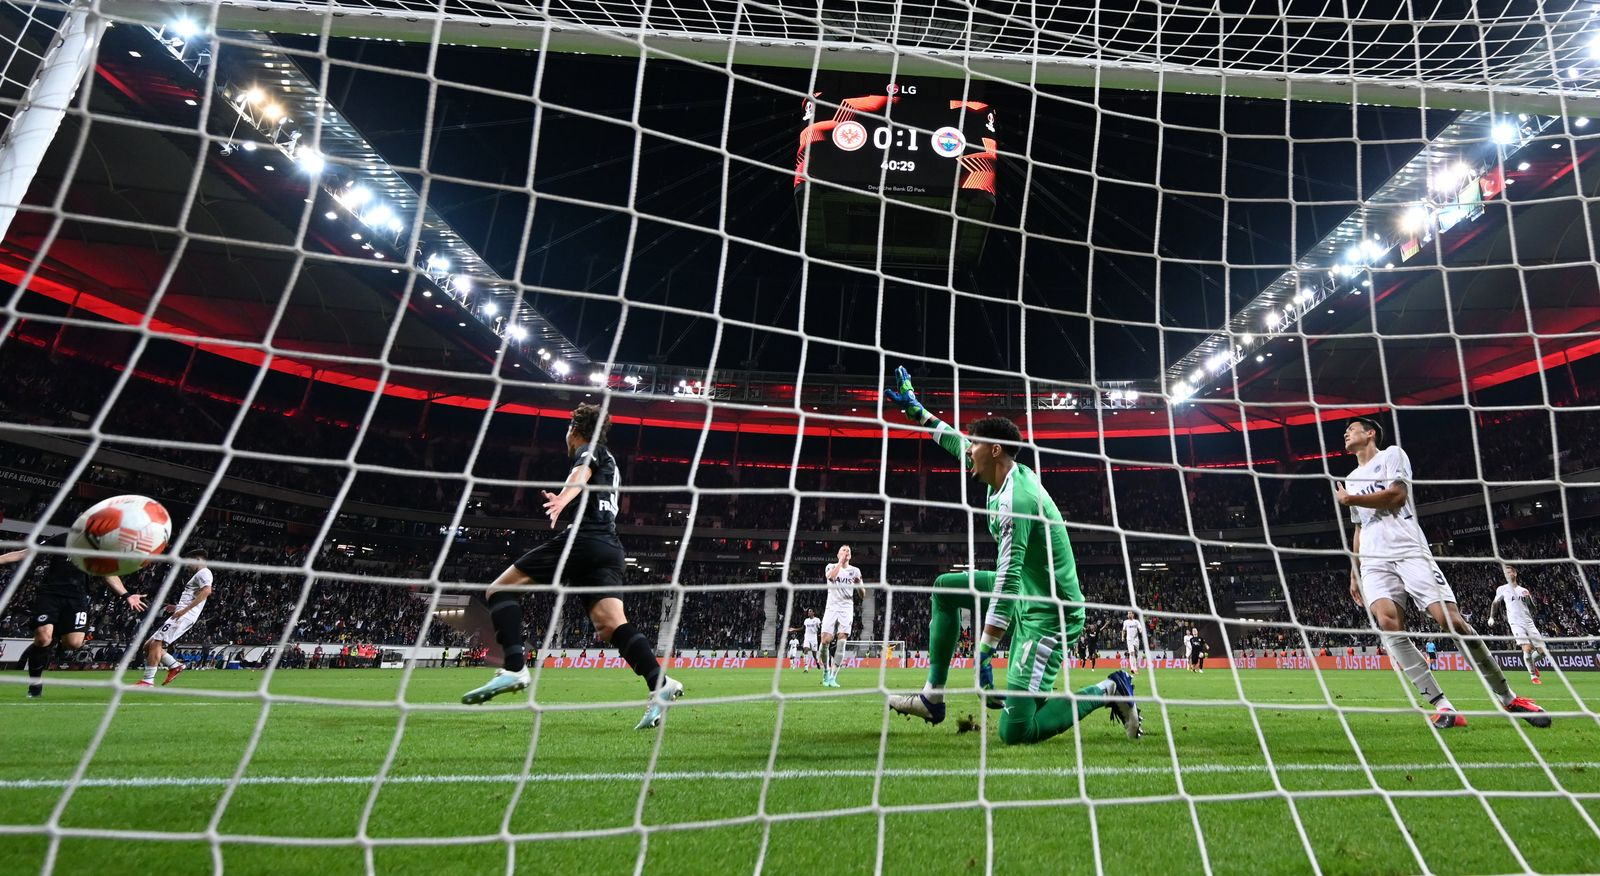 Eintracht Frankfurt - Fenerbahce Istanbul